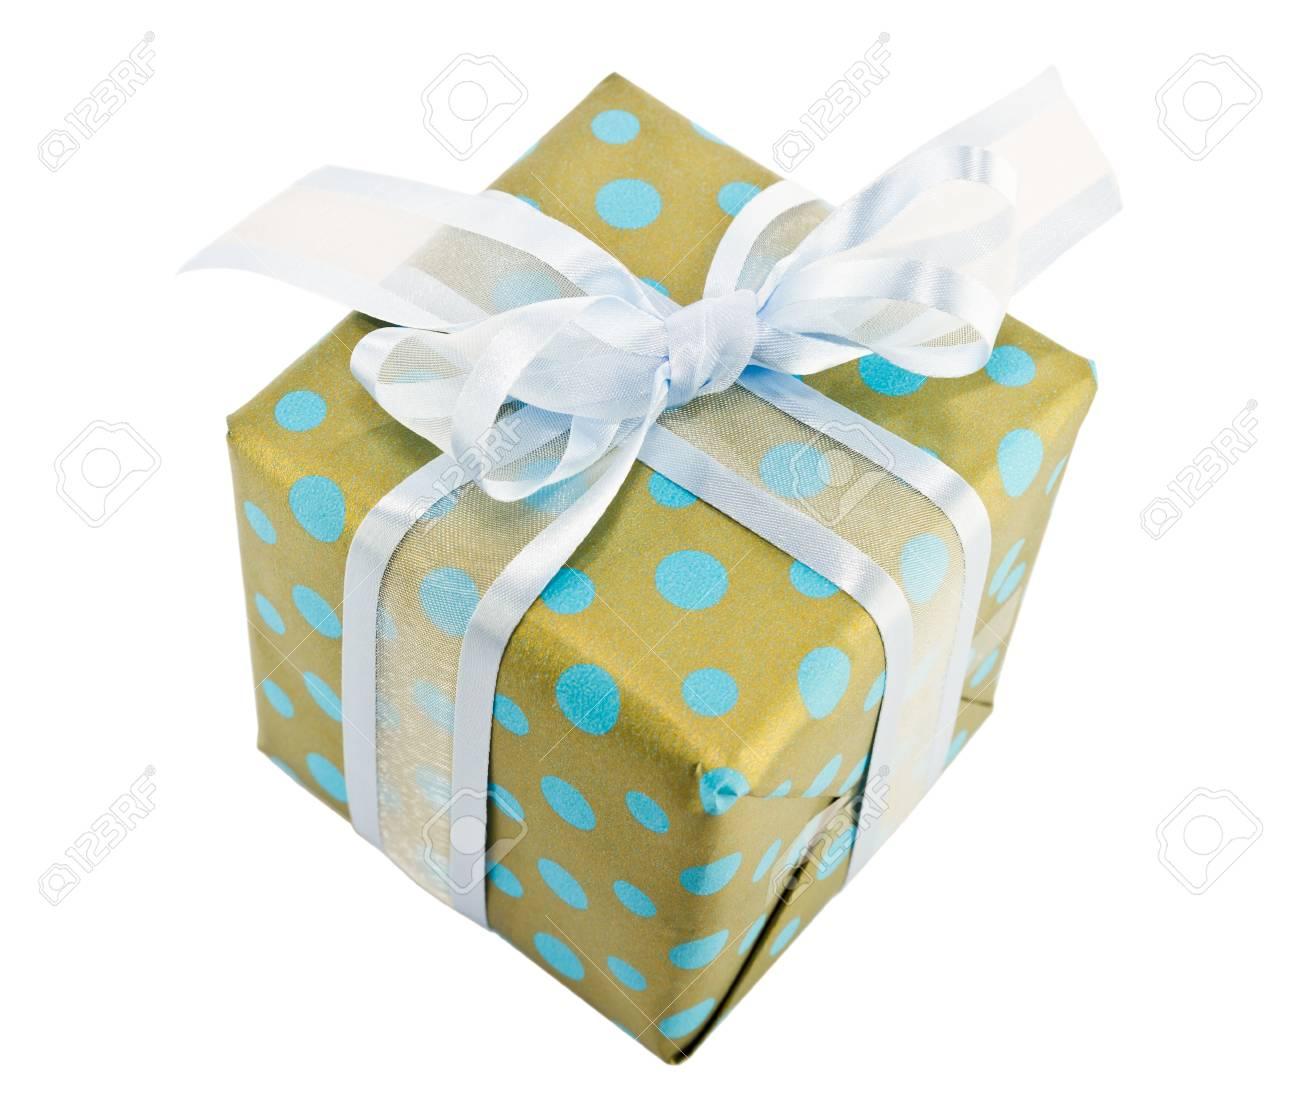 Gift box on white background Stock Photo - 11901878